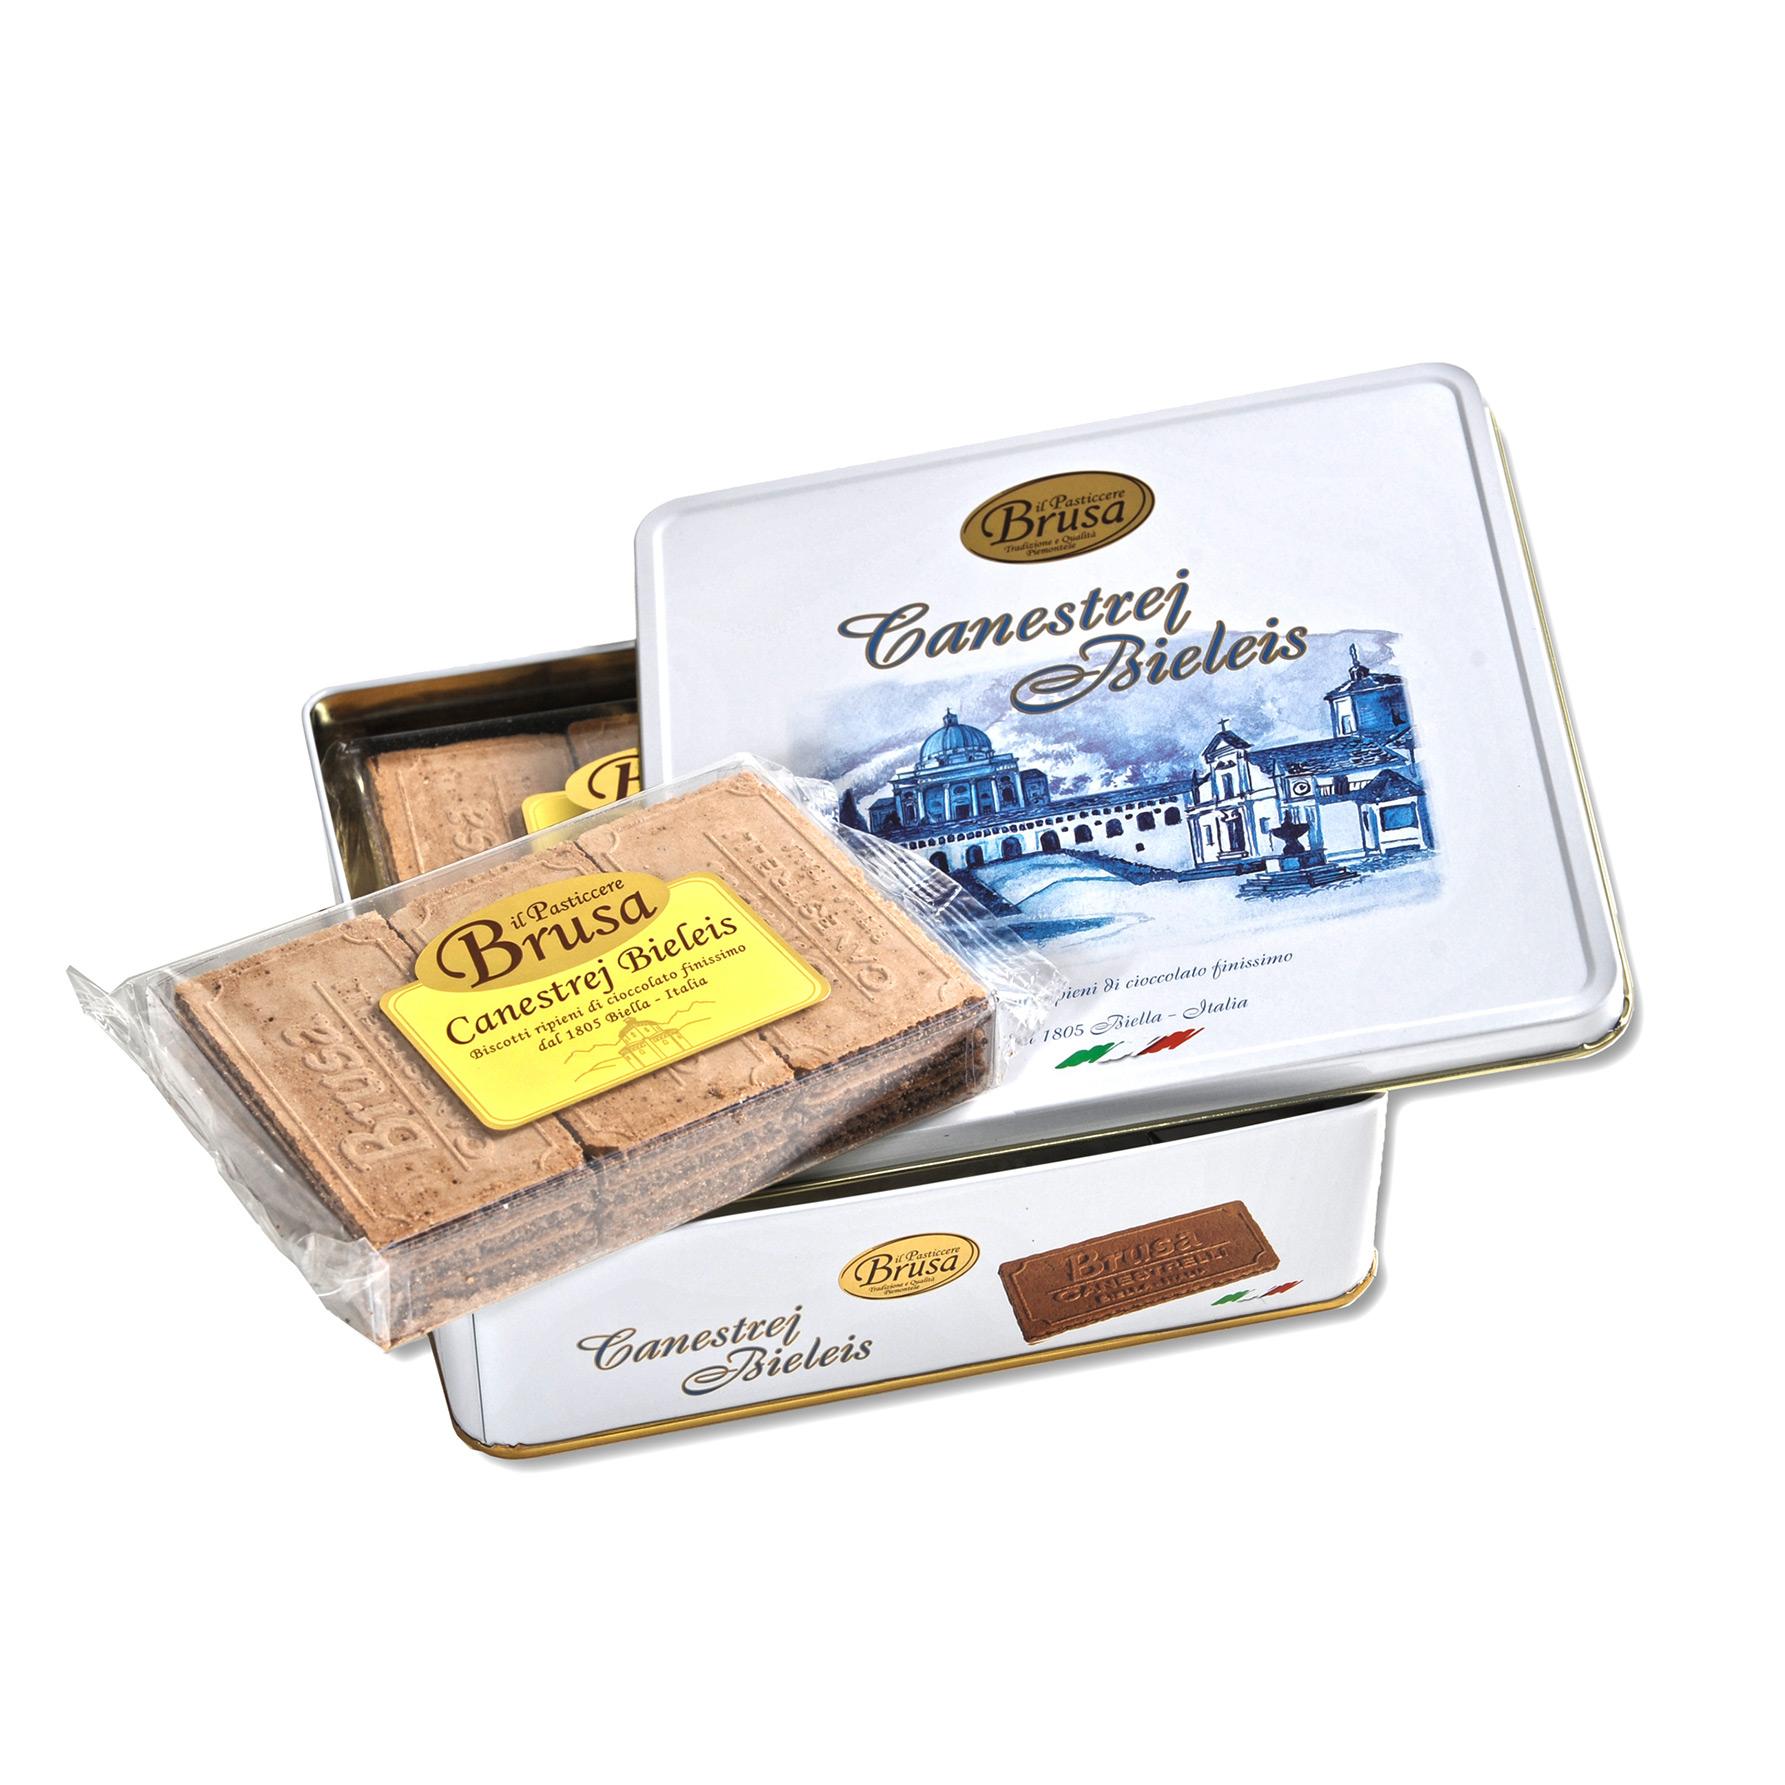 canestrelli-biellesi饼干-铁盒装-270g